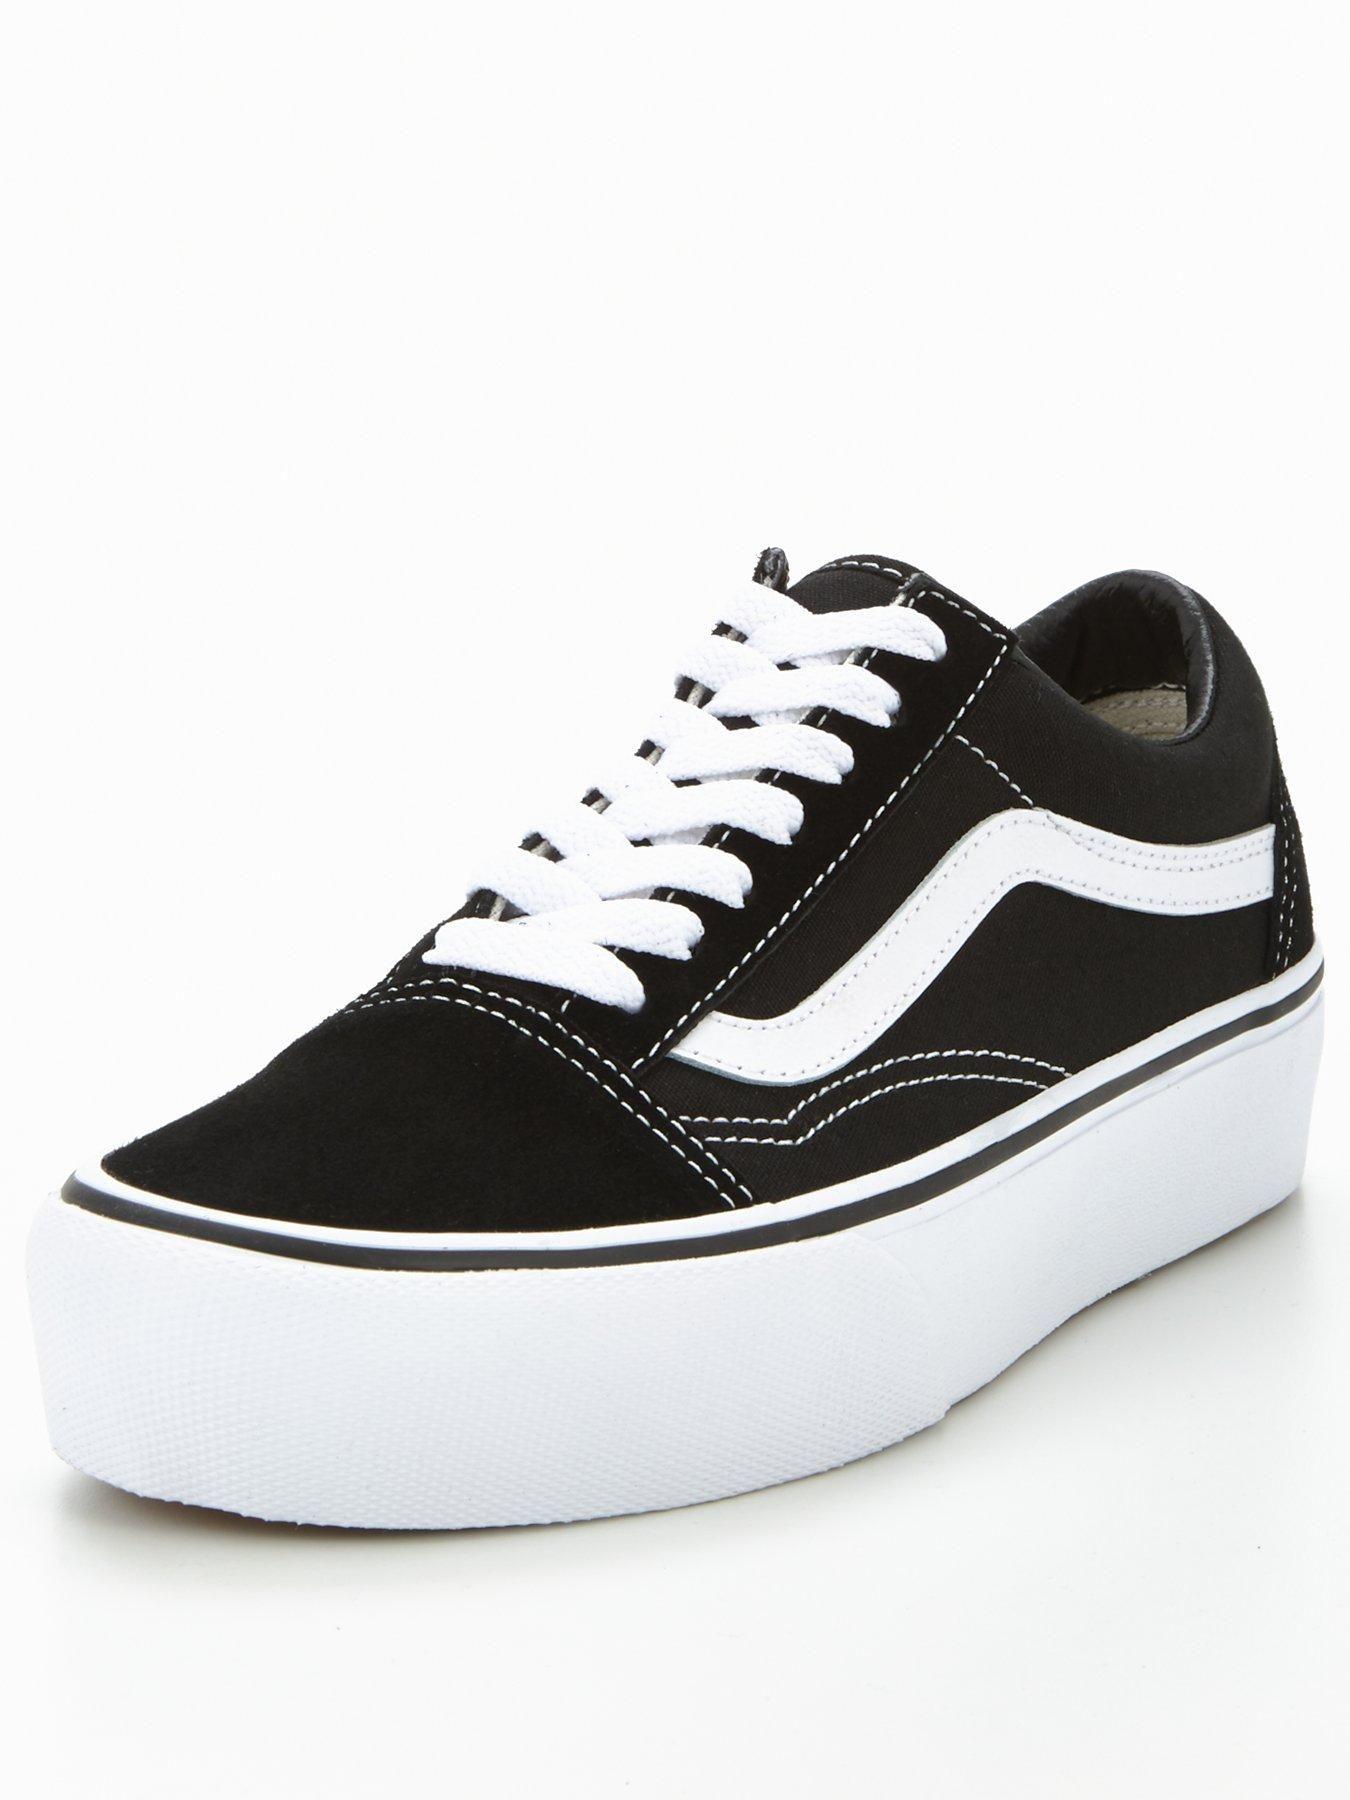 Vans Old Skool Platform - Black/White in 2020 | Black, white ...